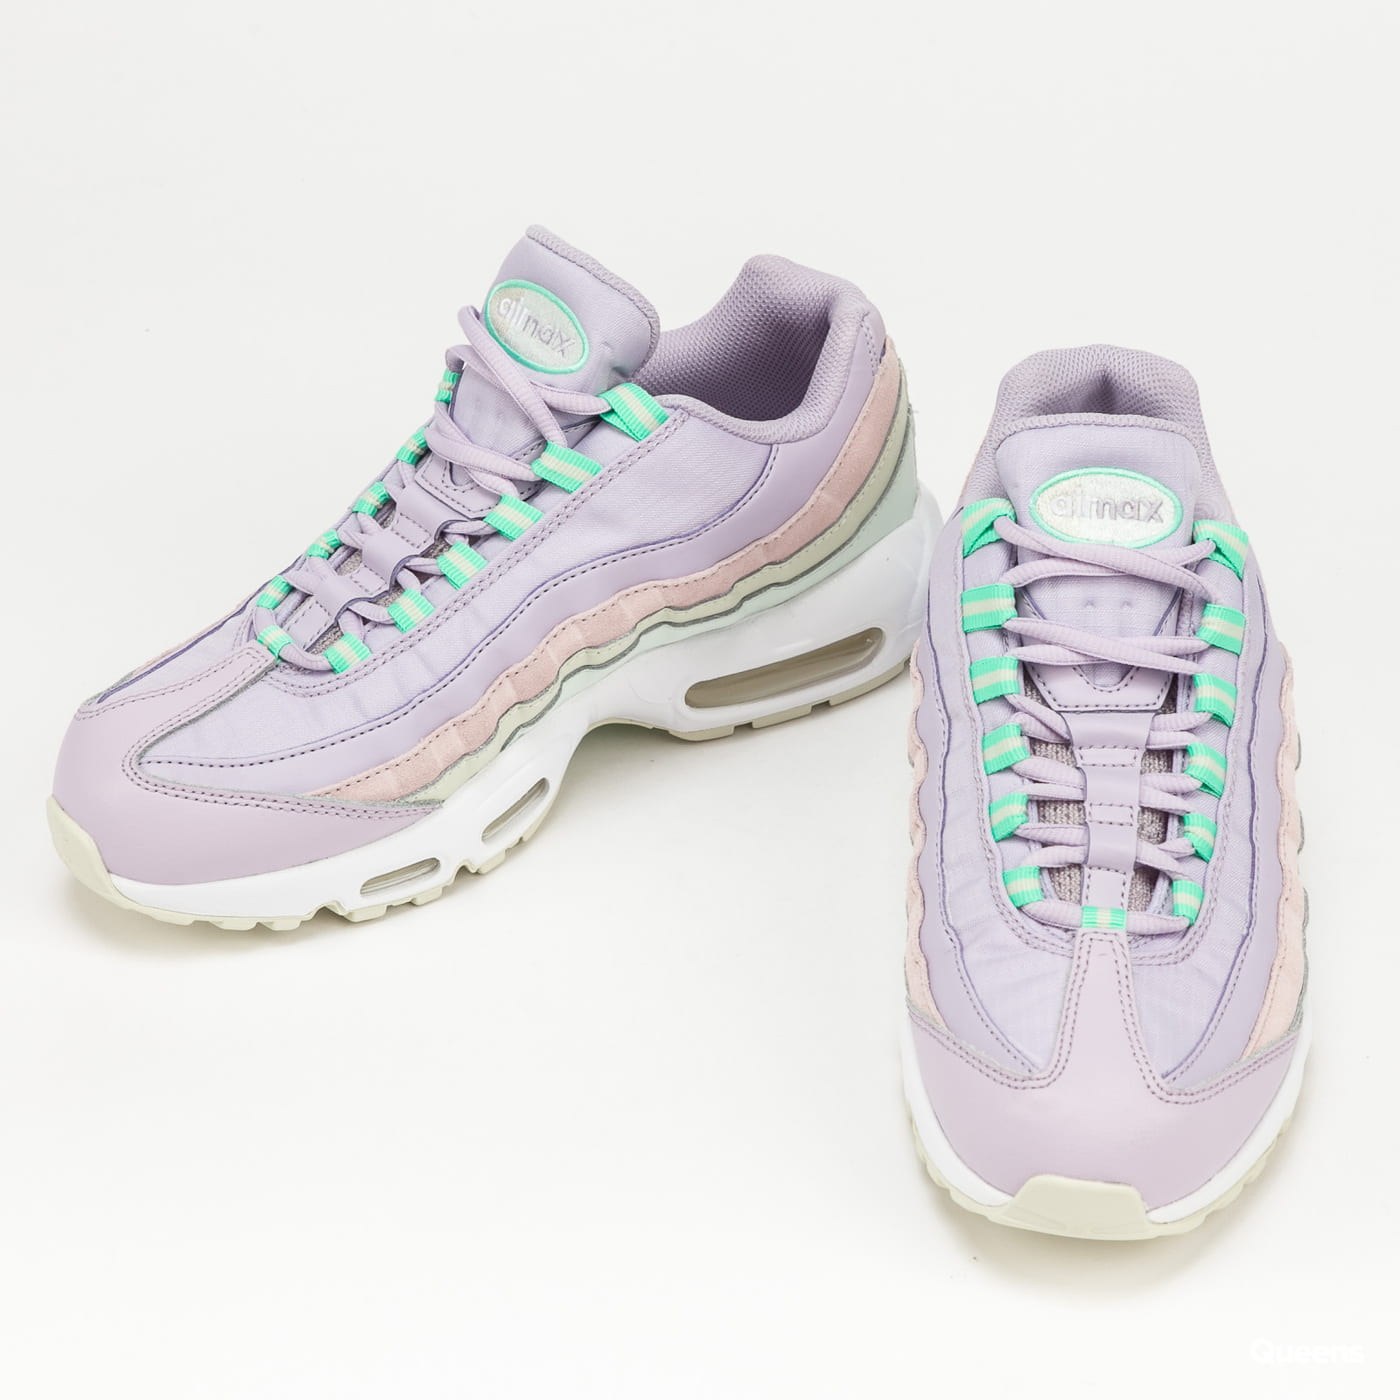 Nike W Air Max 95 infinite lilac / white - sea glass